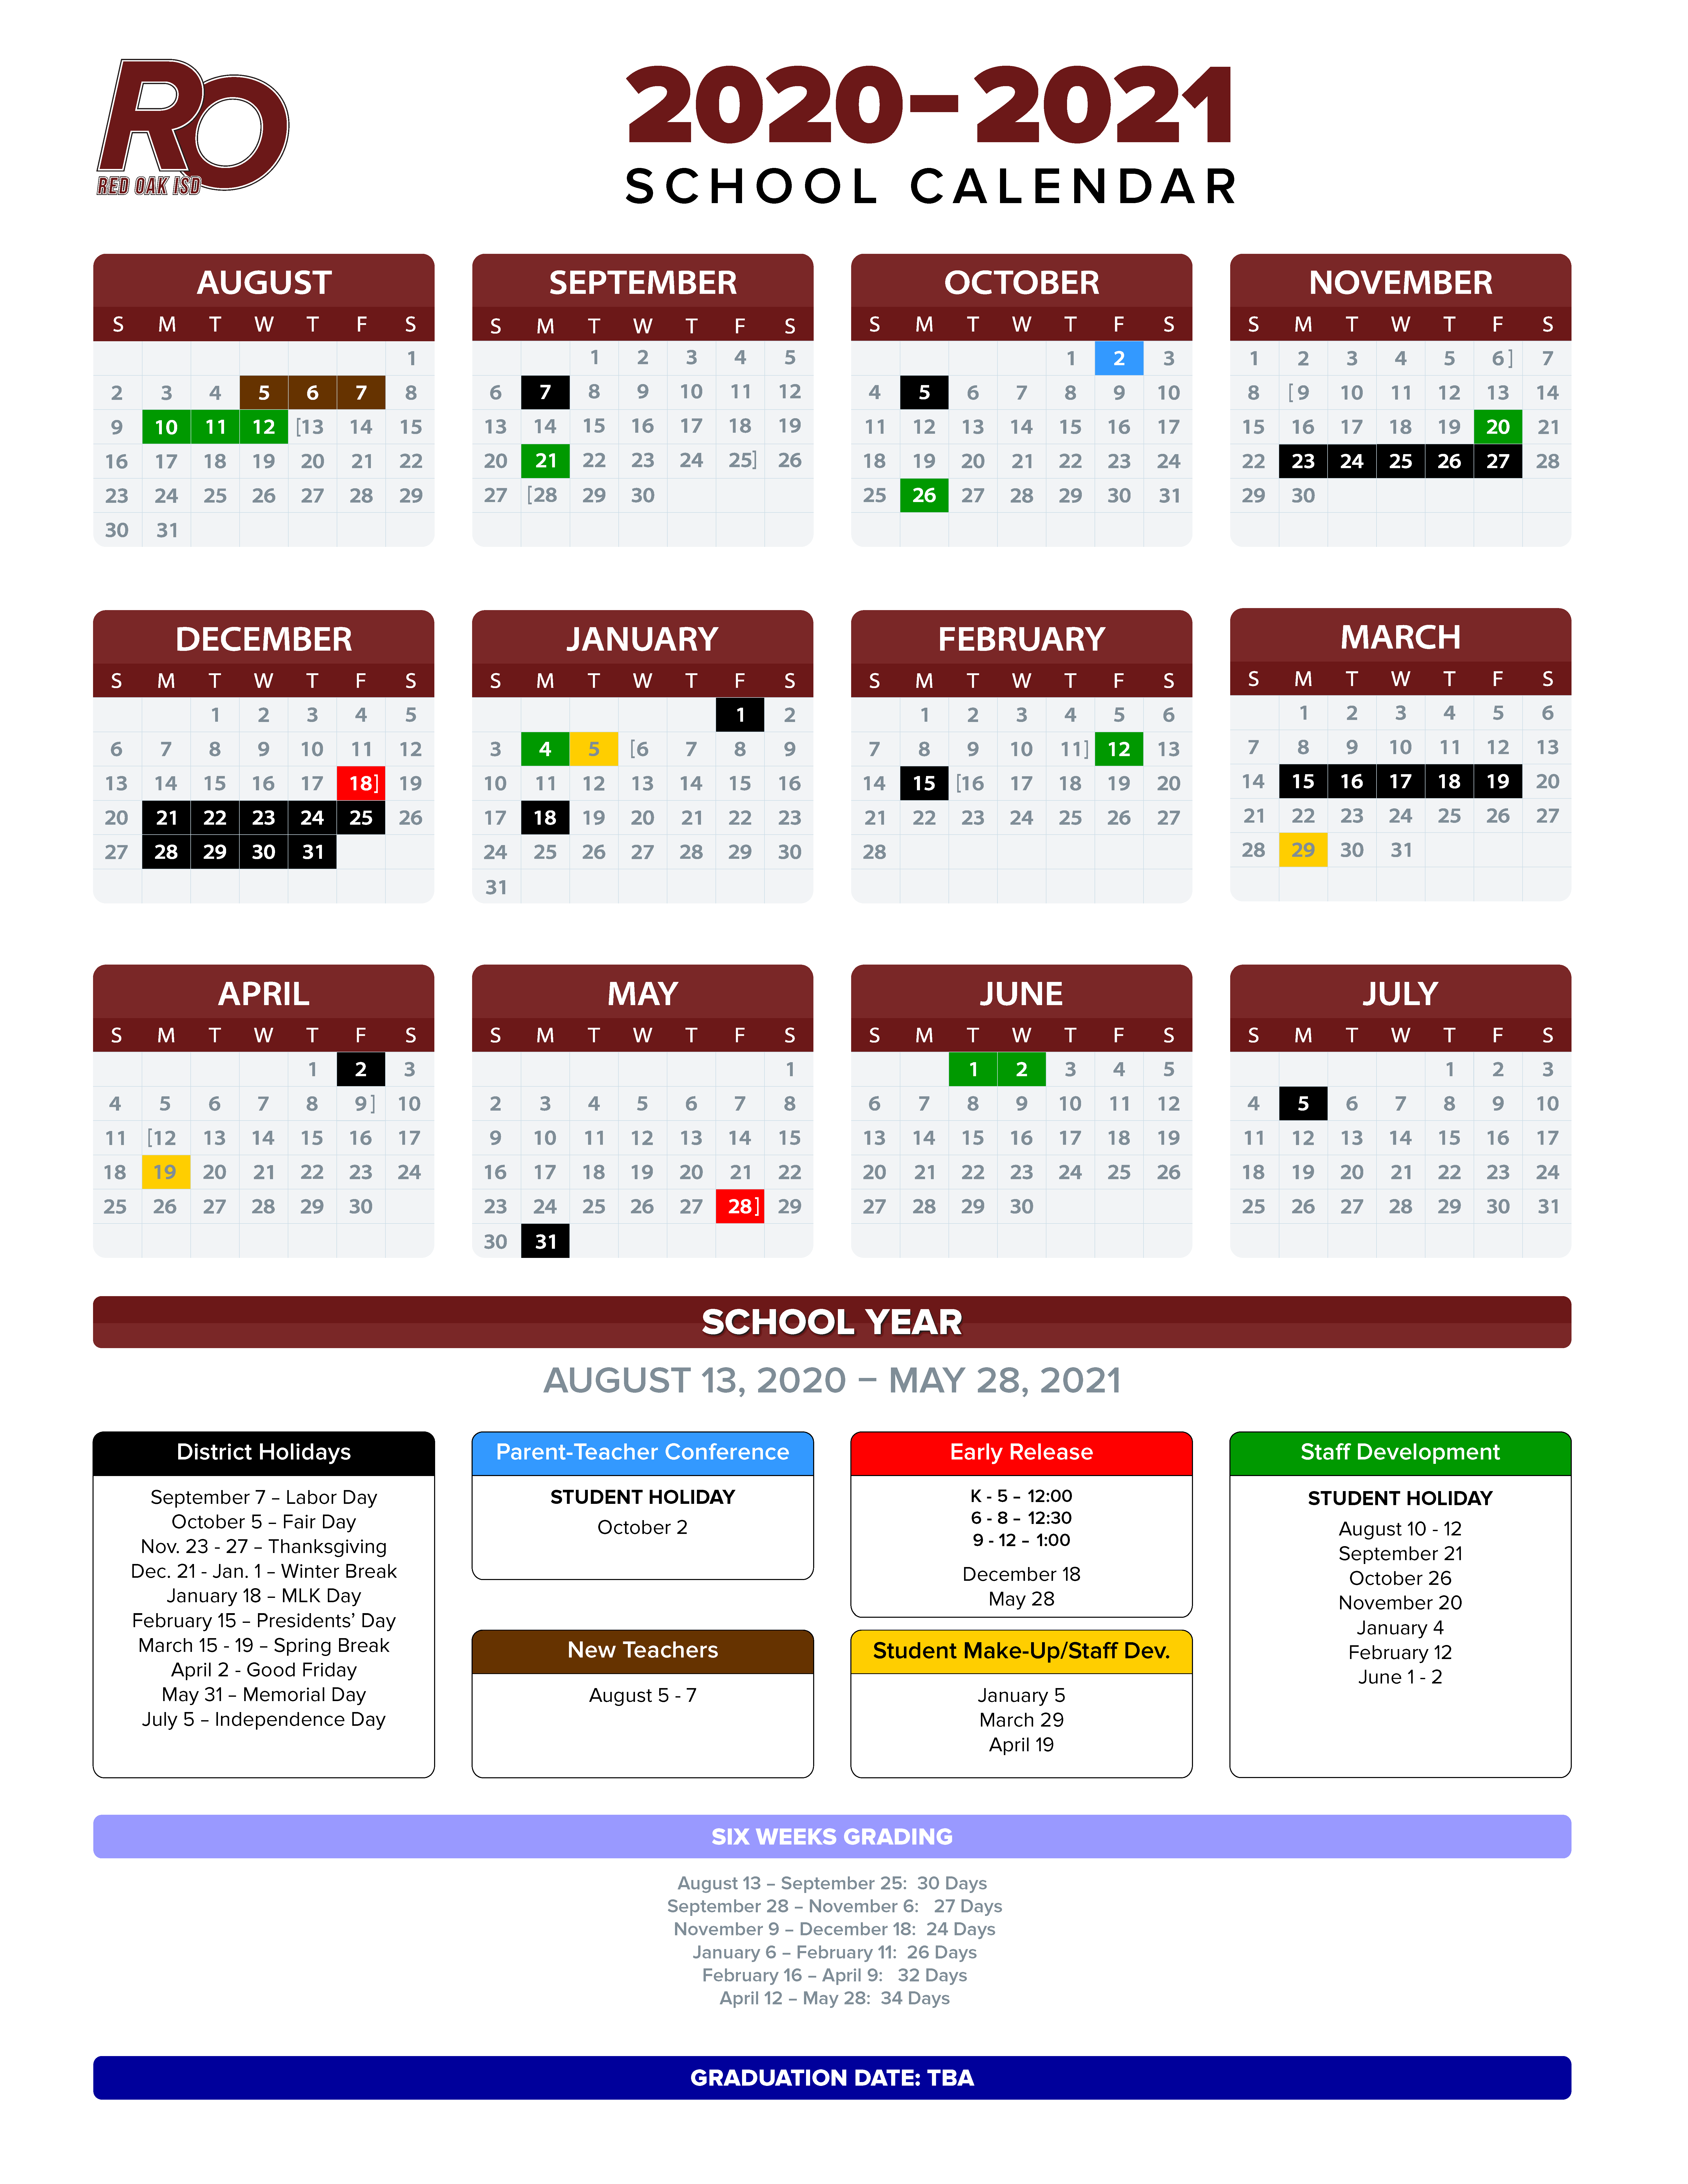 Red Oak ISD 2020-2021 calendar